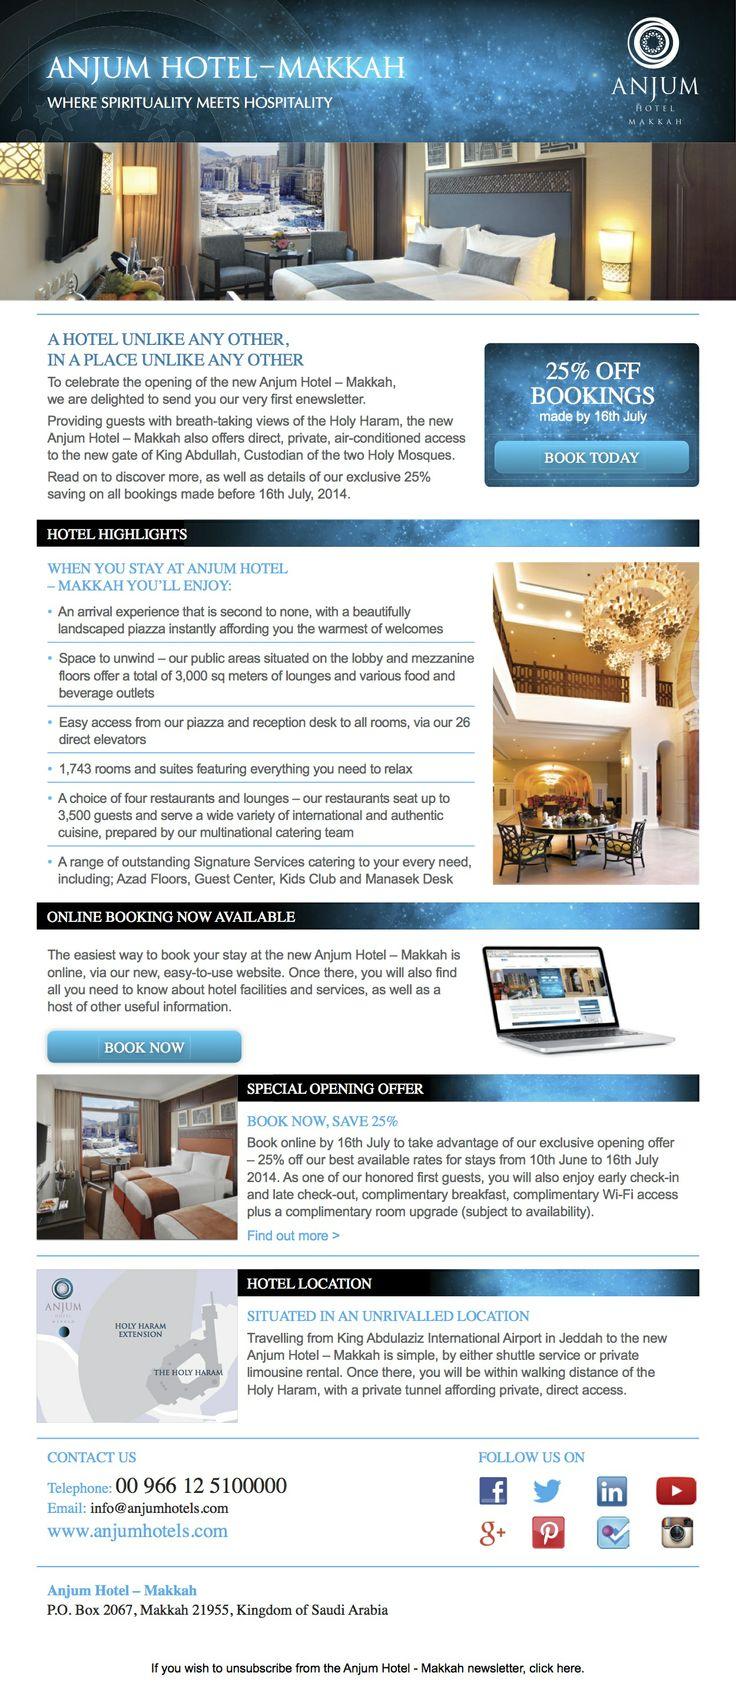 Anjum Hotel Makkah First newsletter is out!!!